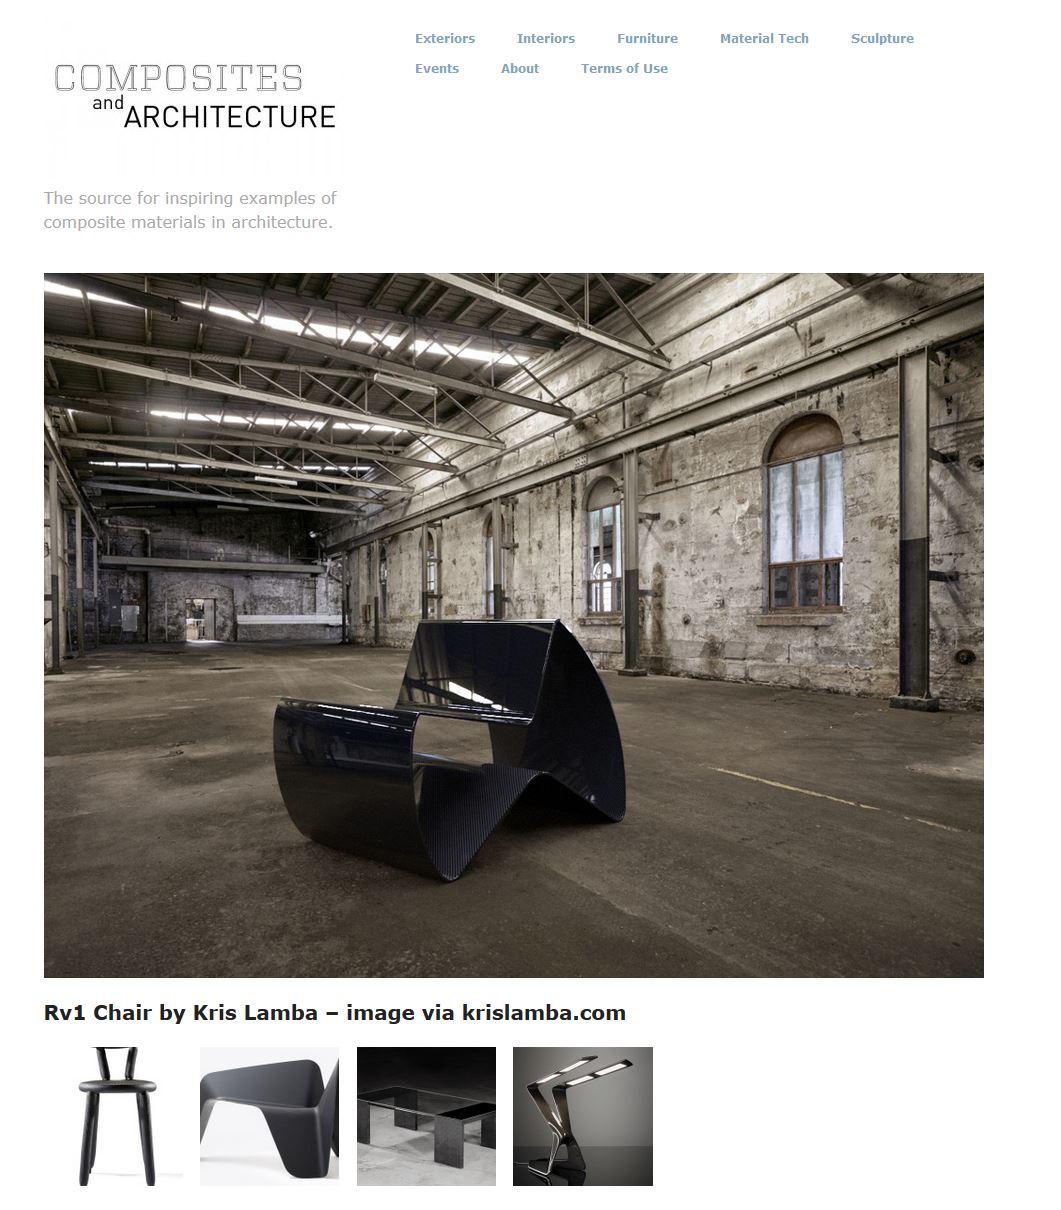 Composites and Architecture - RV1